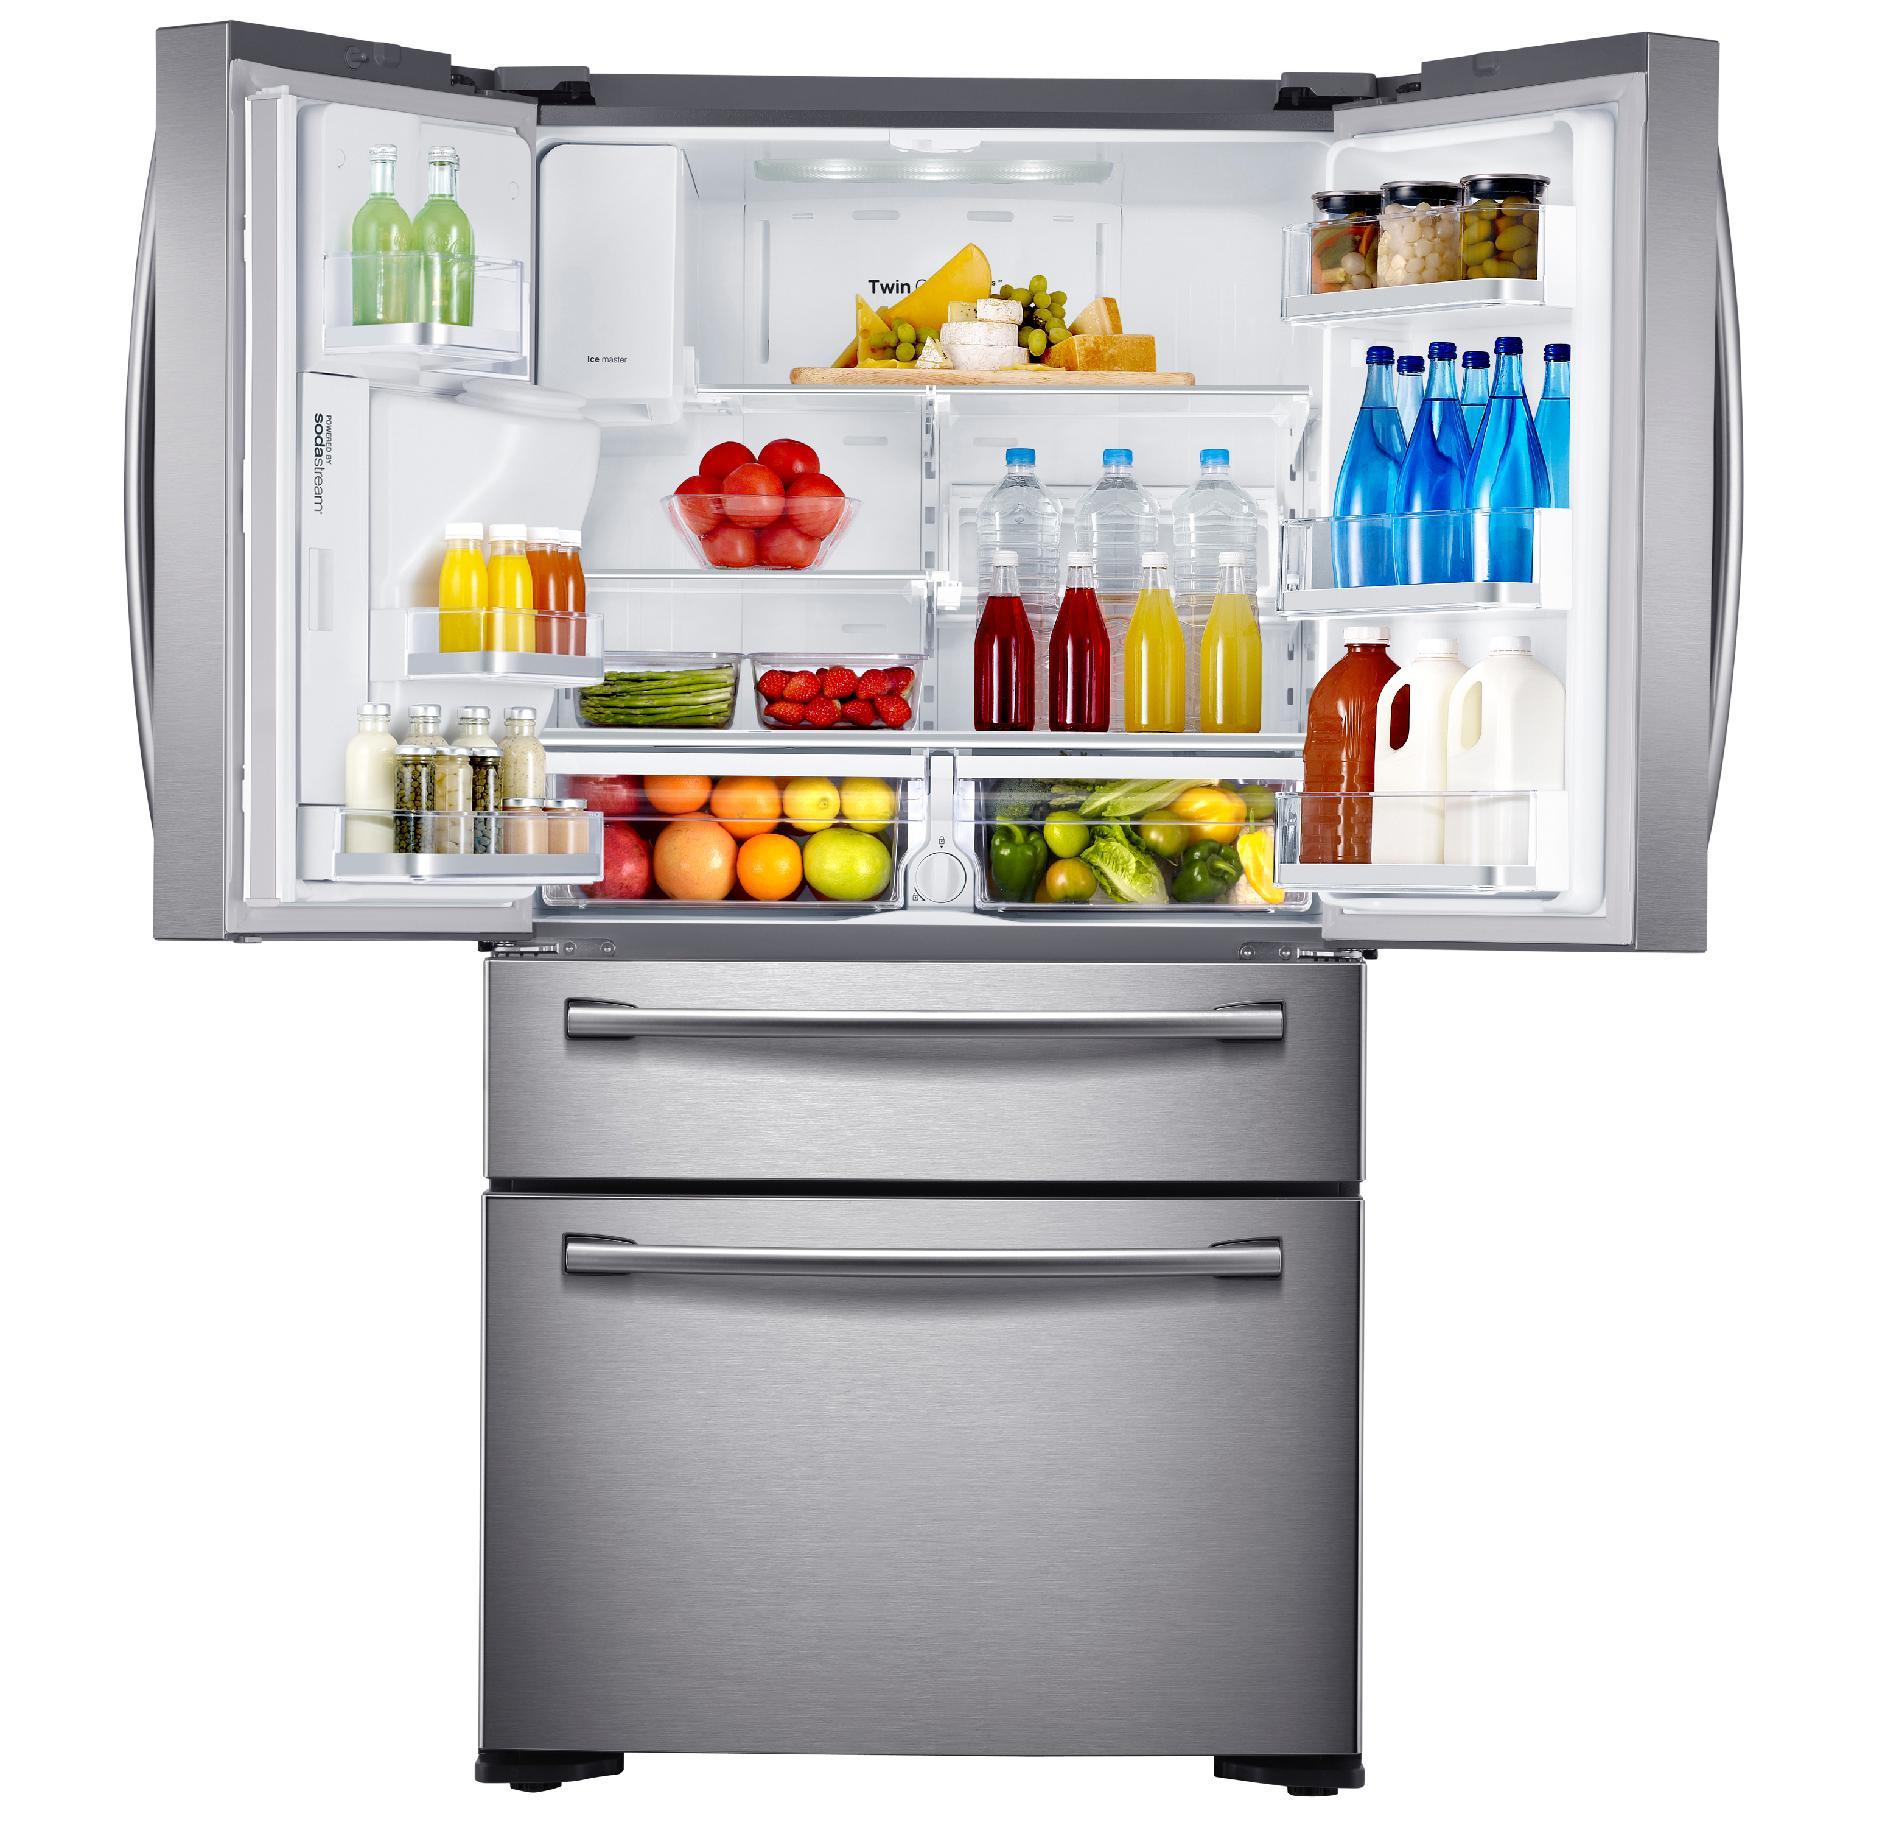 Samsung 23 cu. ft. Counter-Depth French Door Refrigerator w/ Sparkling Water Dispenser - Stainless Steel